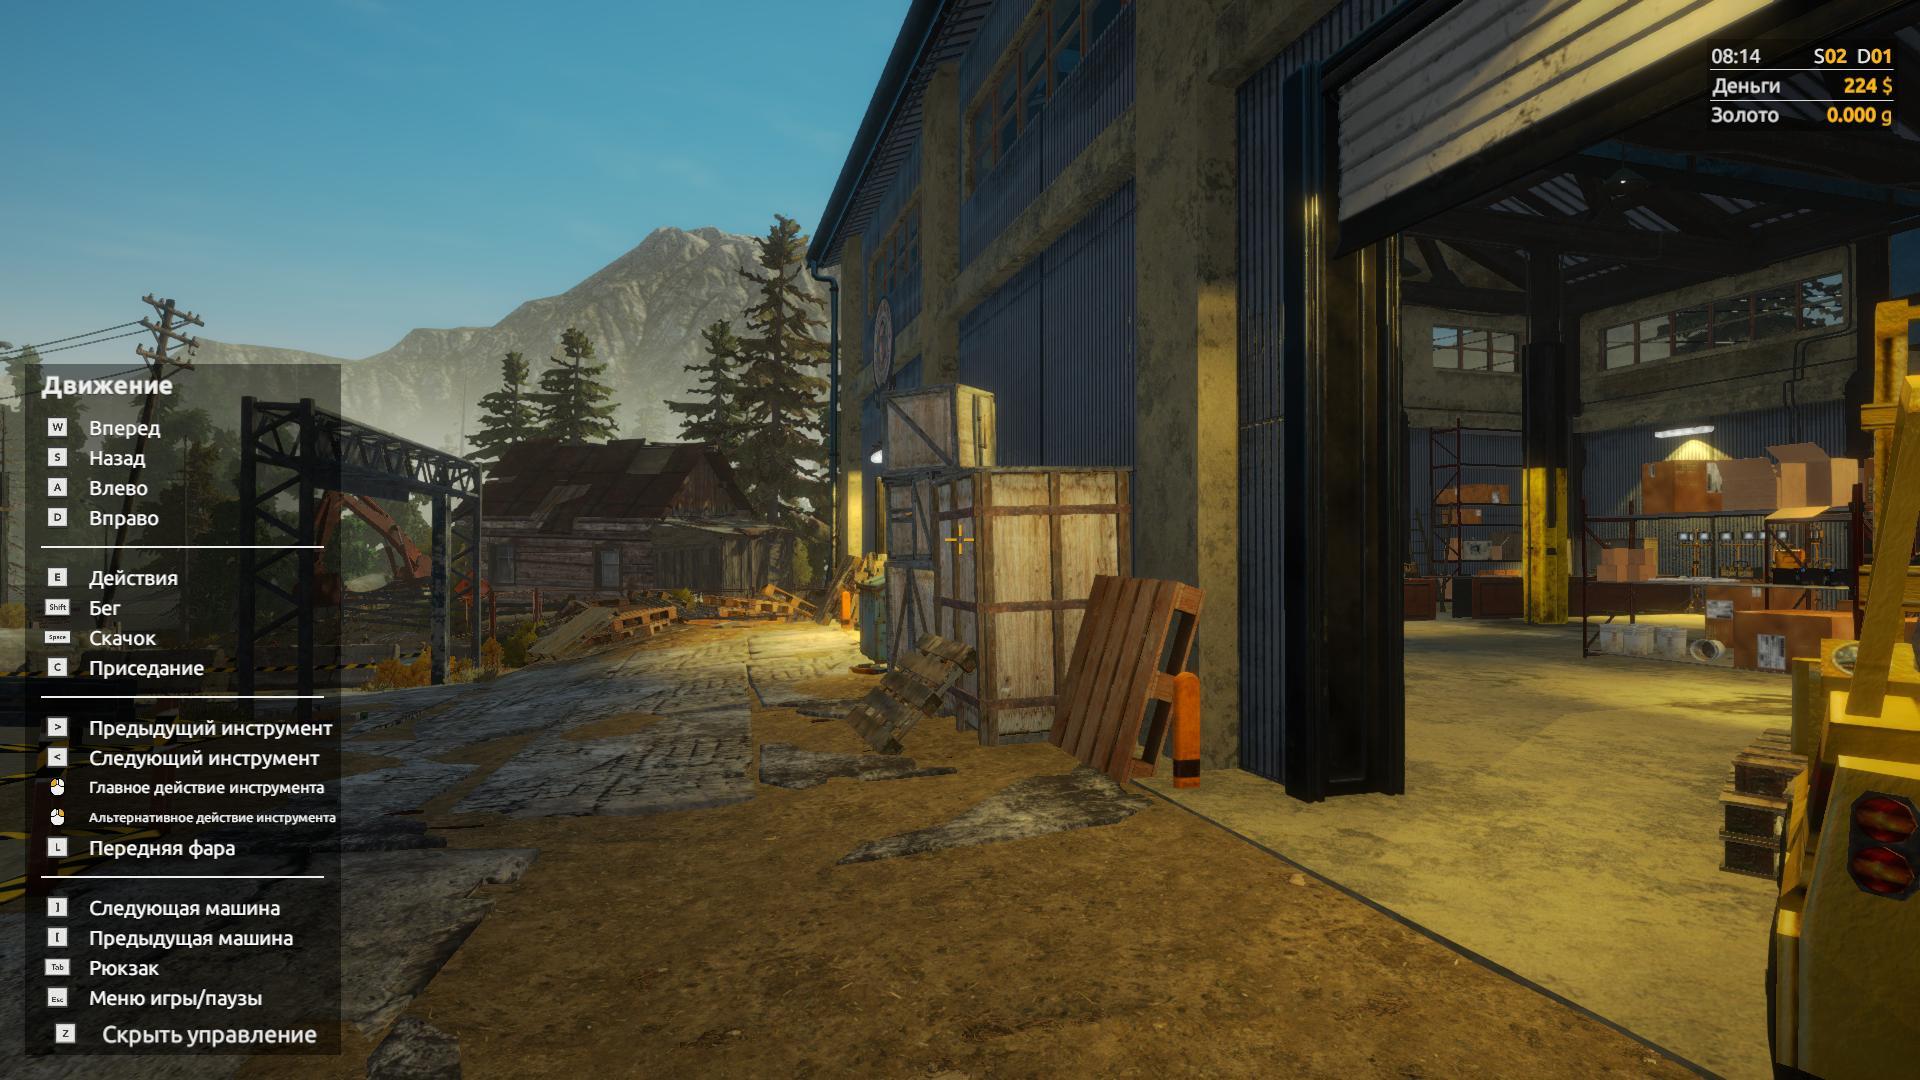 Gold Rush: The Game [v 1.2.7068 + DLC] (2017) PC | RePack от xatab